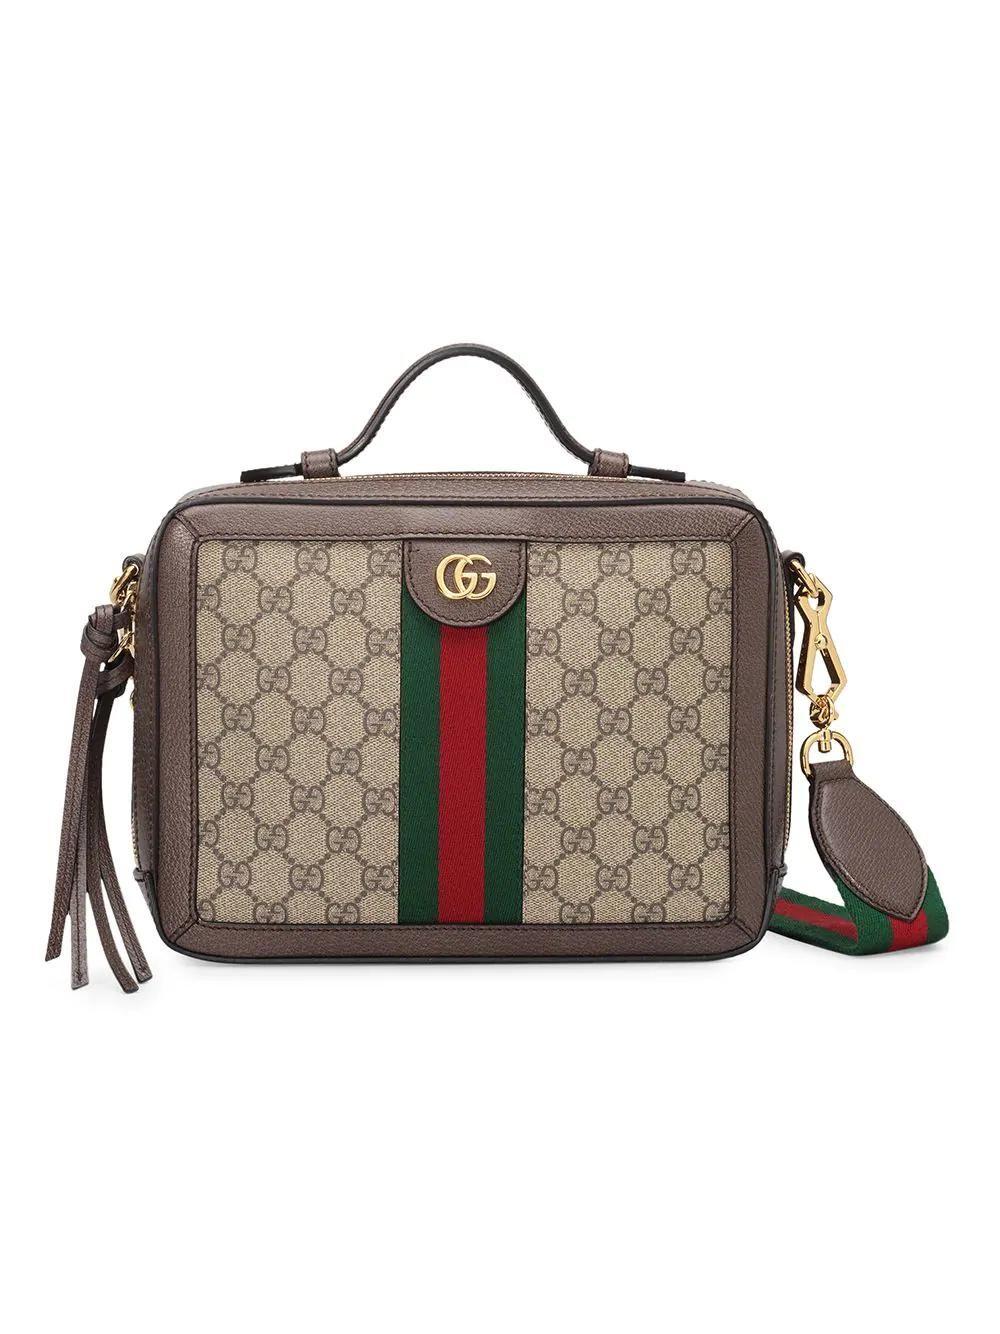 226f086fa83 Gucci Small Ophidia Gg Supreme Canvas Shoulder Bag - Beige In 8745 Gg Beige